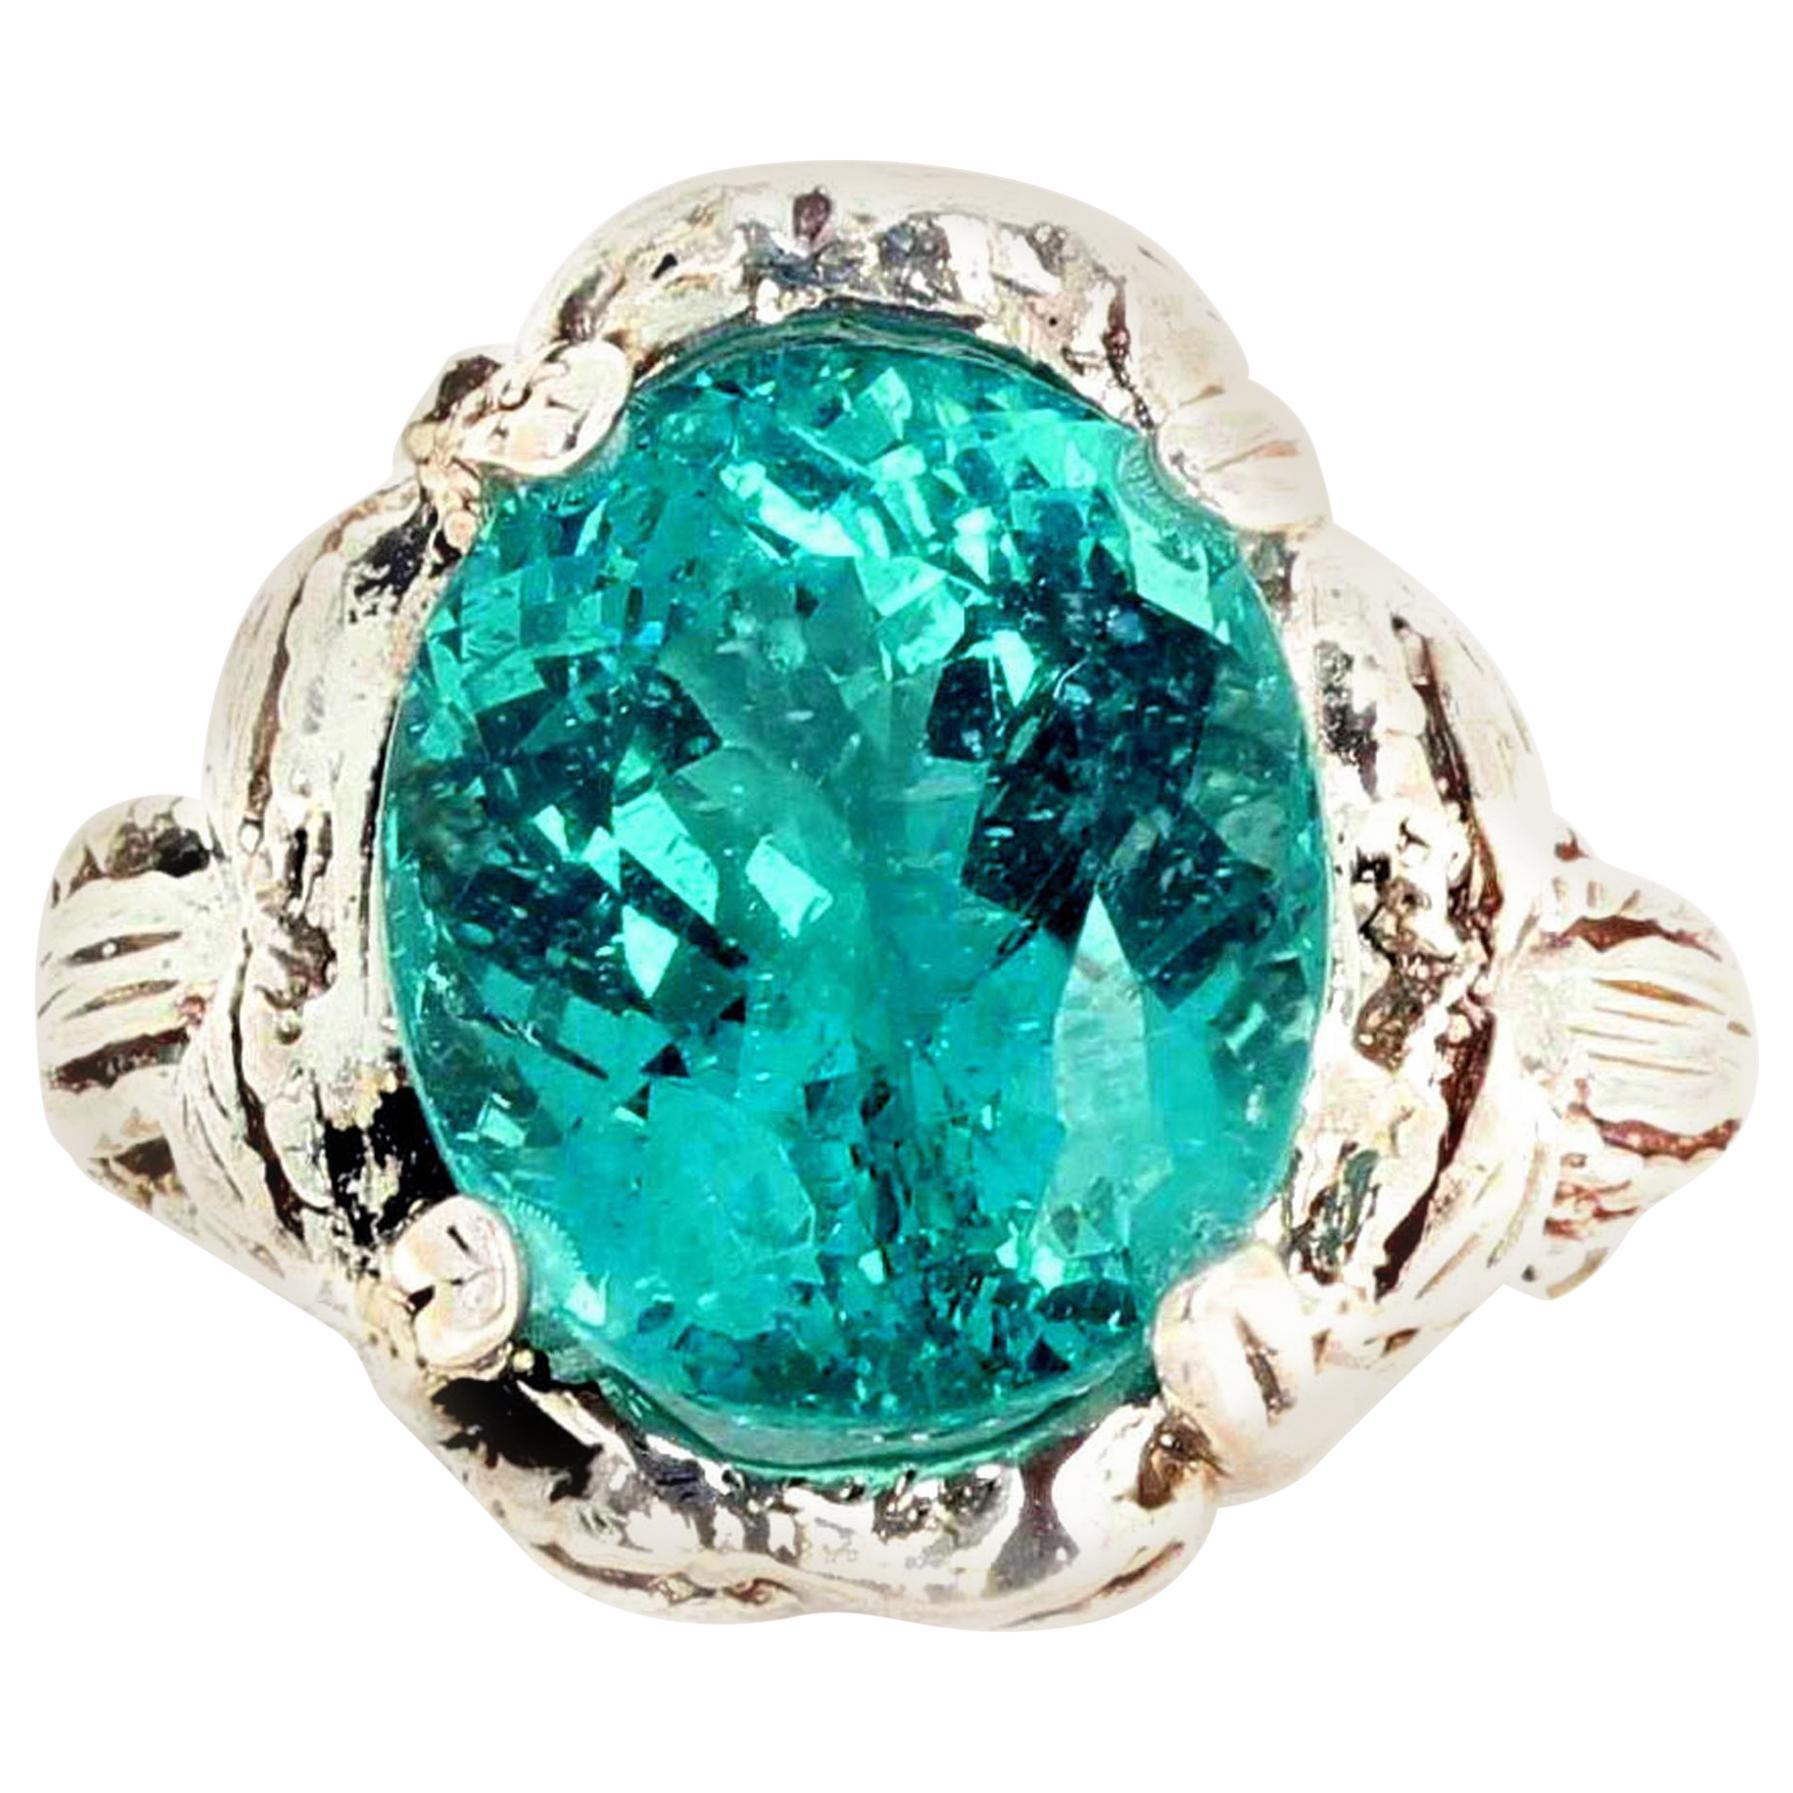 Gemjunky Magnificent Glittering 8.63 Carat Natural Rare Apatite Ring